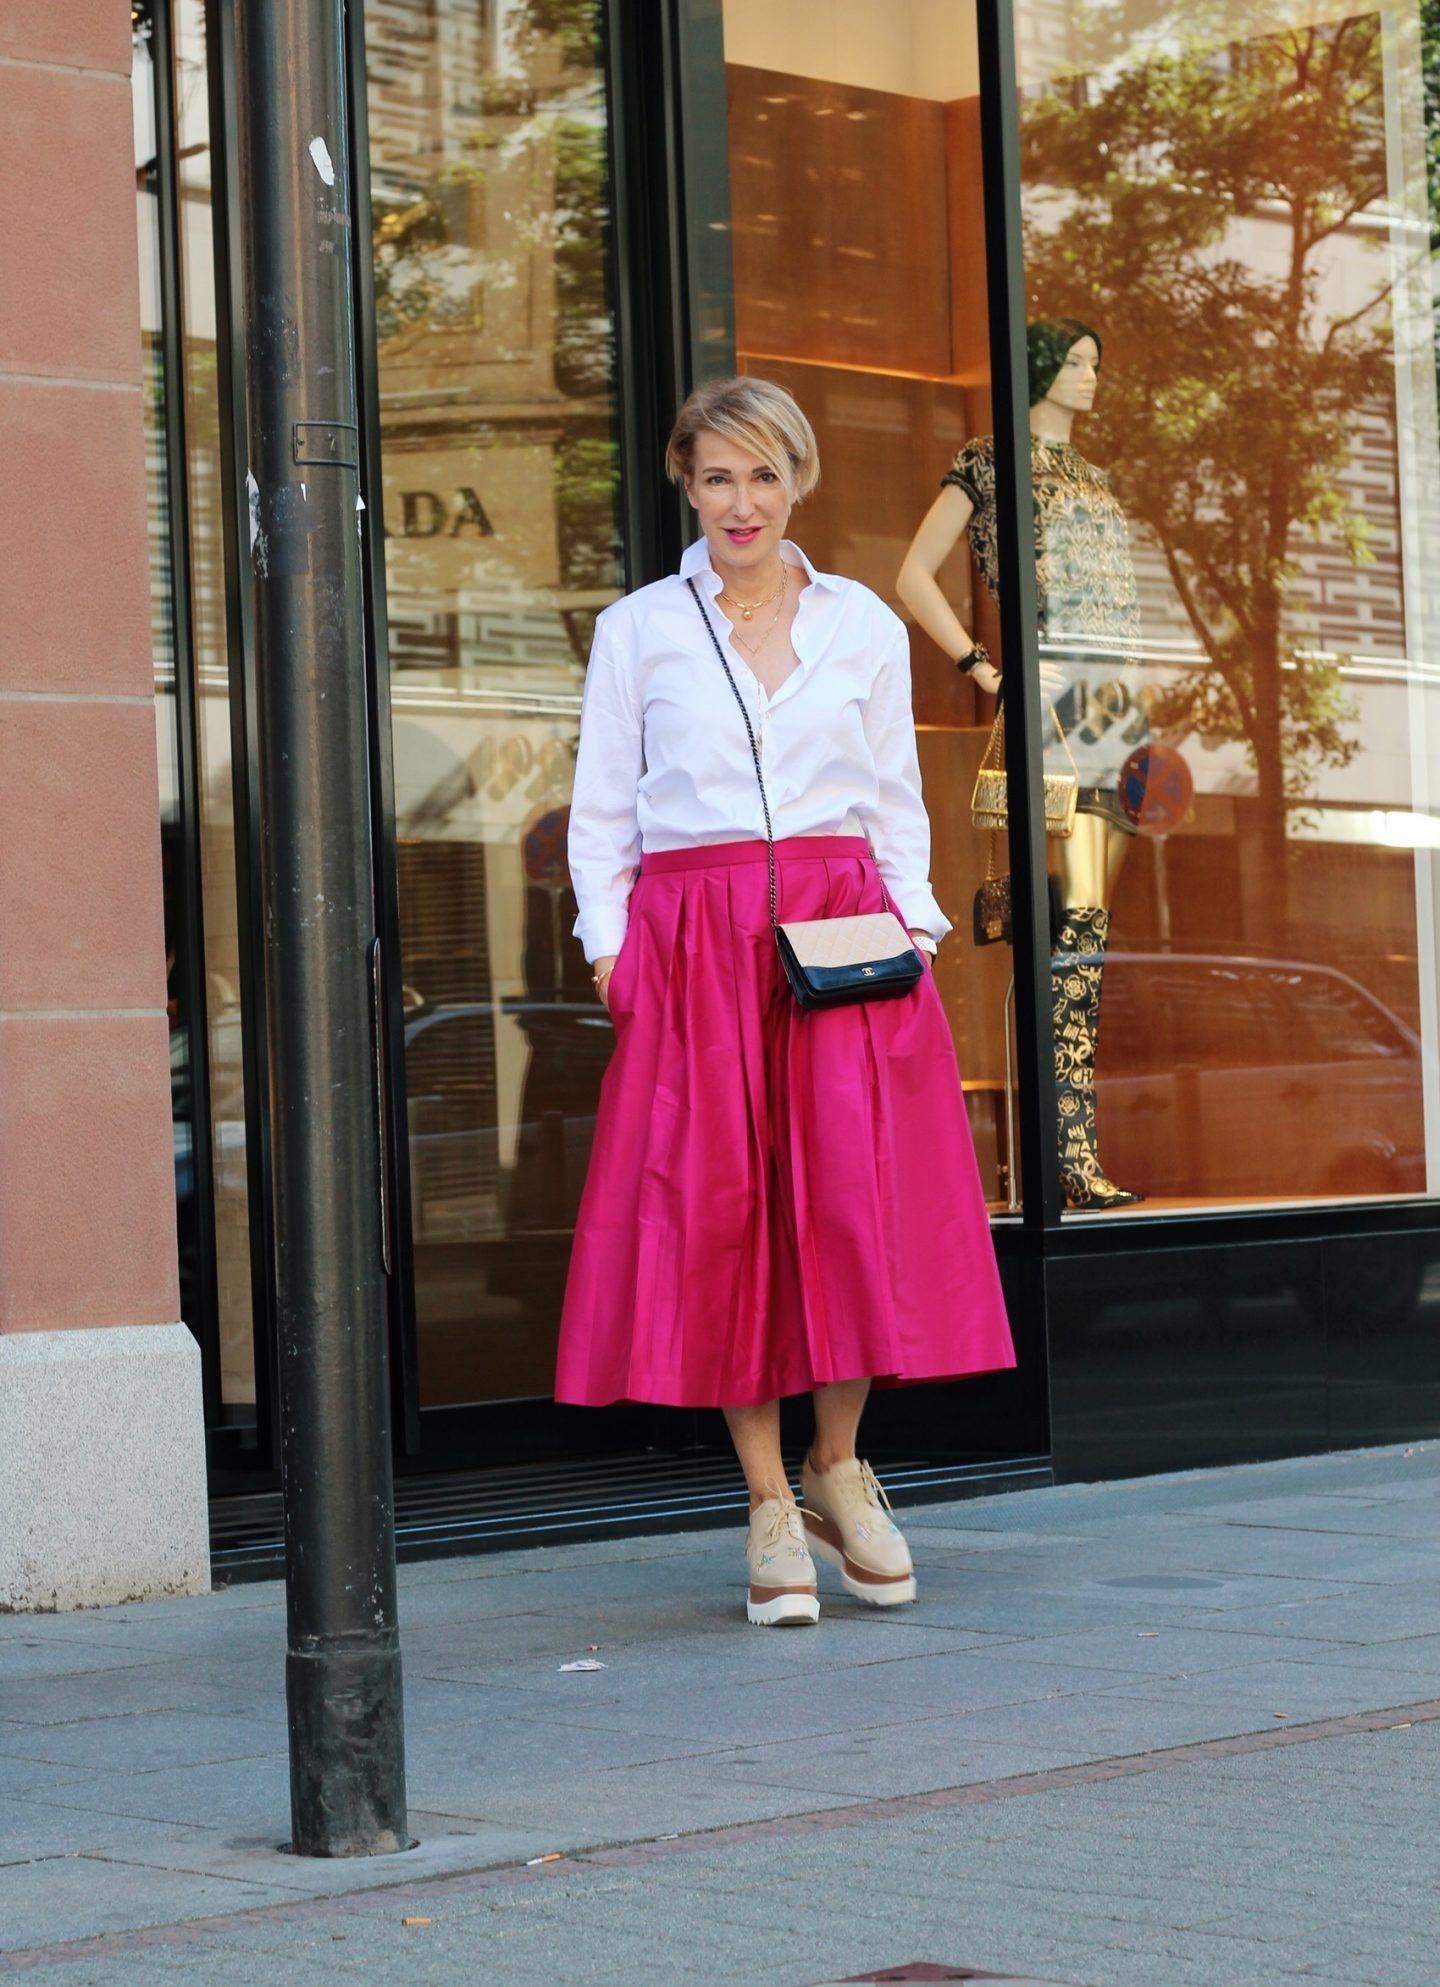 glamupyourlifestyle pink Sommerrock pinker-Rock Midi-Rock ü-40-blogger ü-50-blogger ue-40-blog ue-50-blog